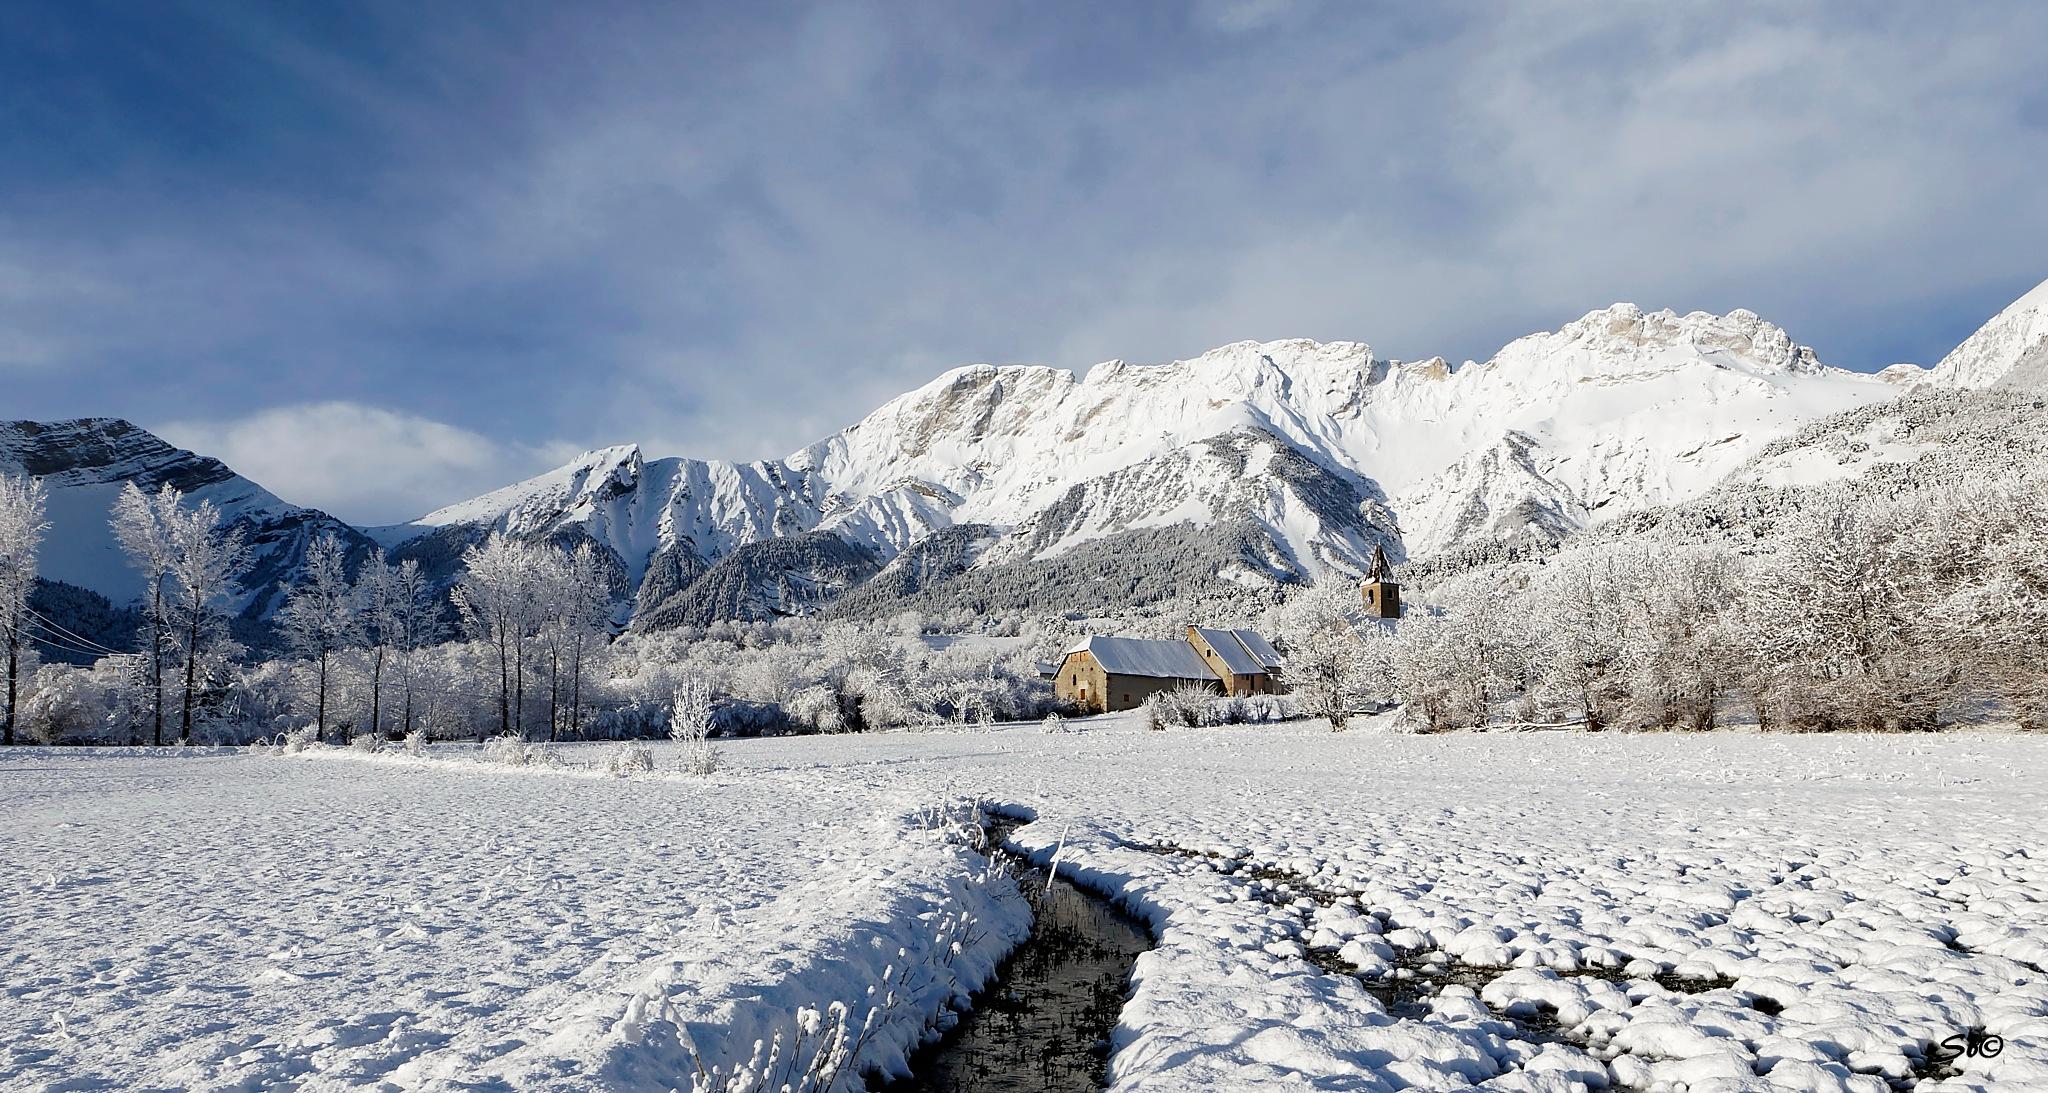 Et toujours l'hiver. by BernardSerge